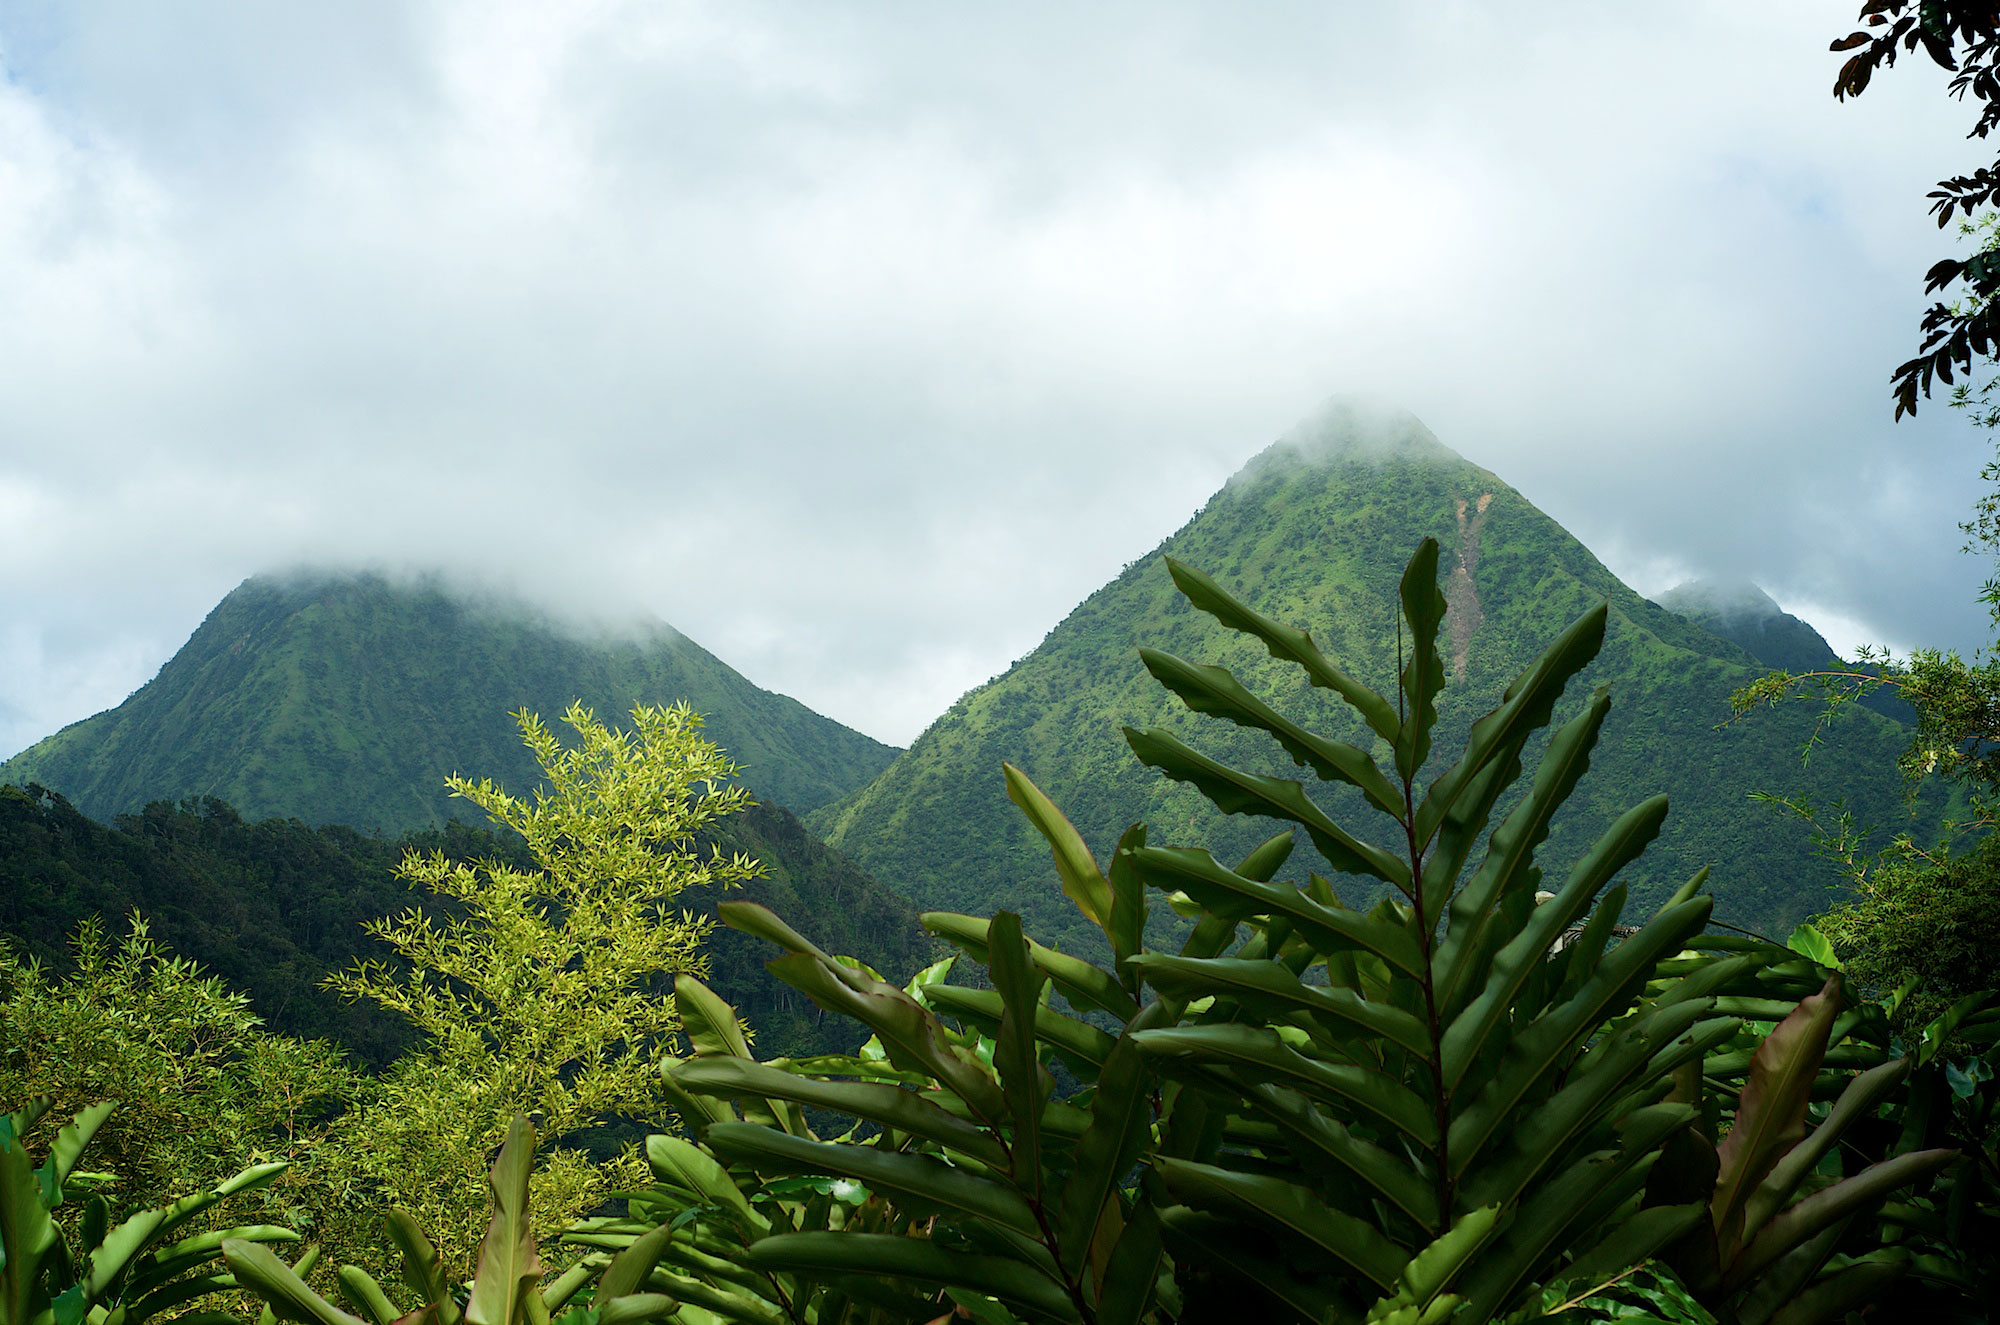 Martinique's Pitons du Carbet: Uncommon Attraction